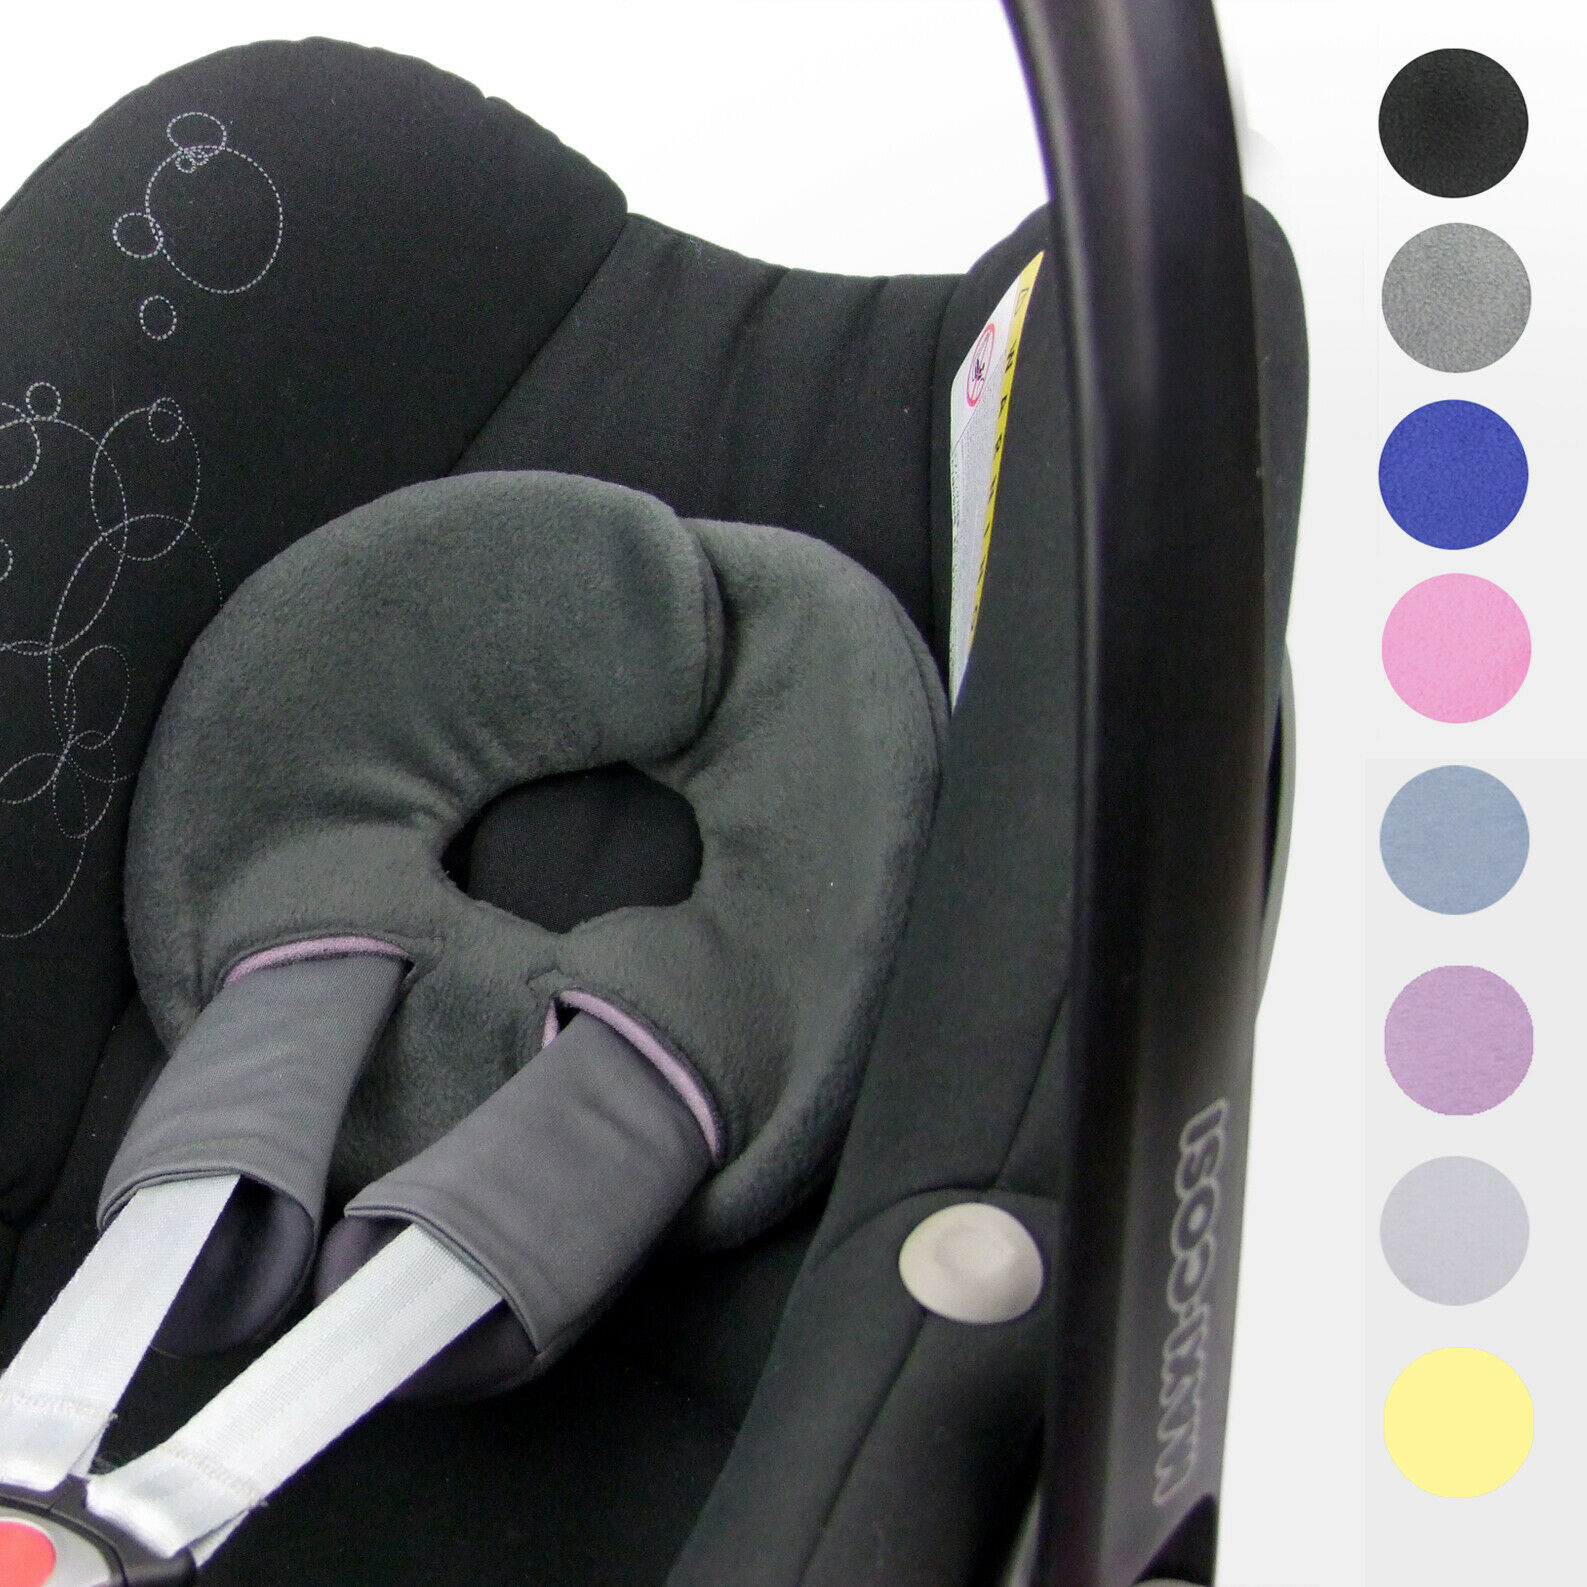 BAMBINIWELT Kopfstütze Kopfpolster für Babyschale MAXI-COSI Pebble, Pebble Plus